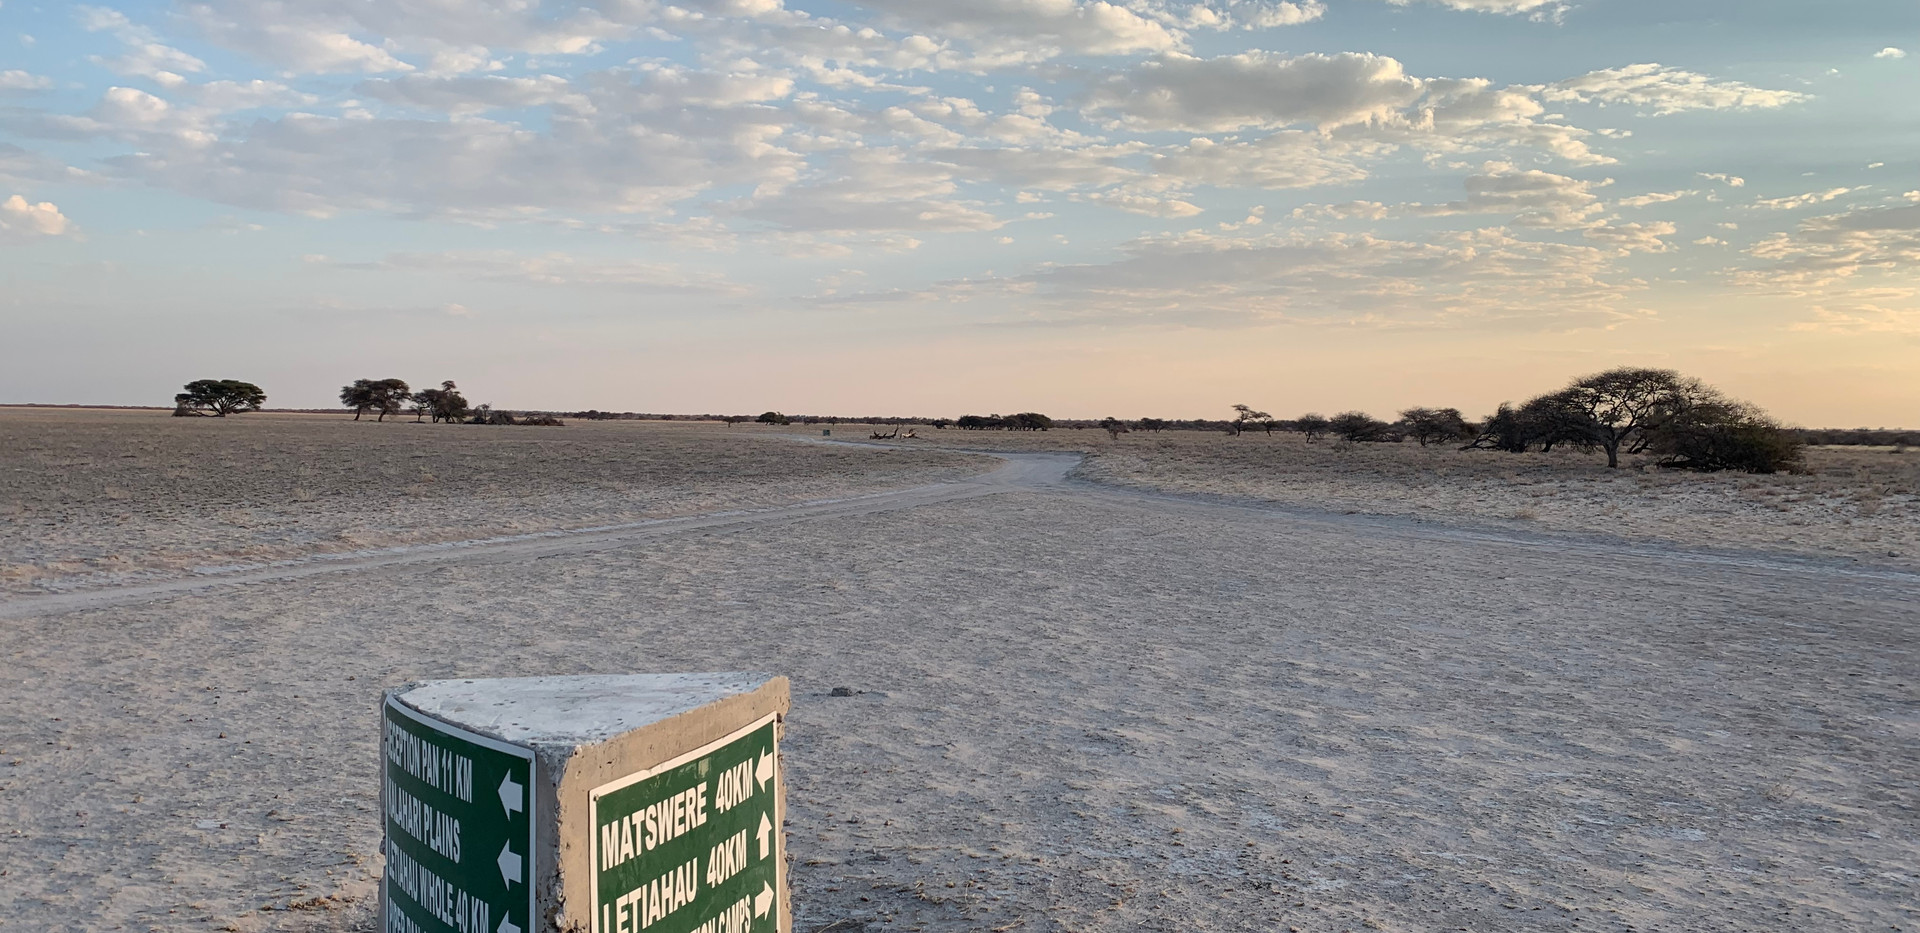 Central Kalahari Game Reserve intersection